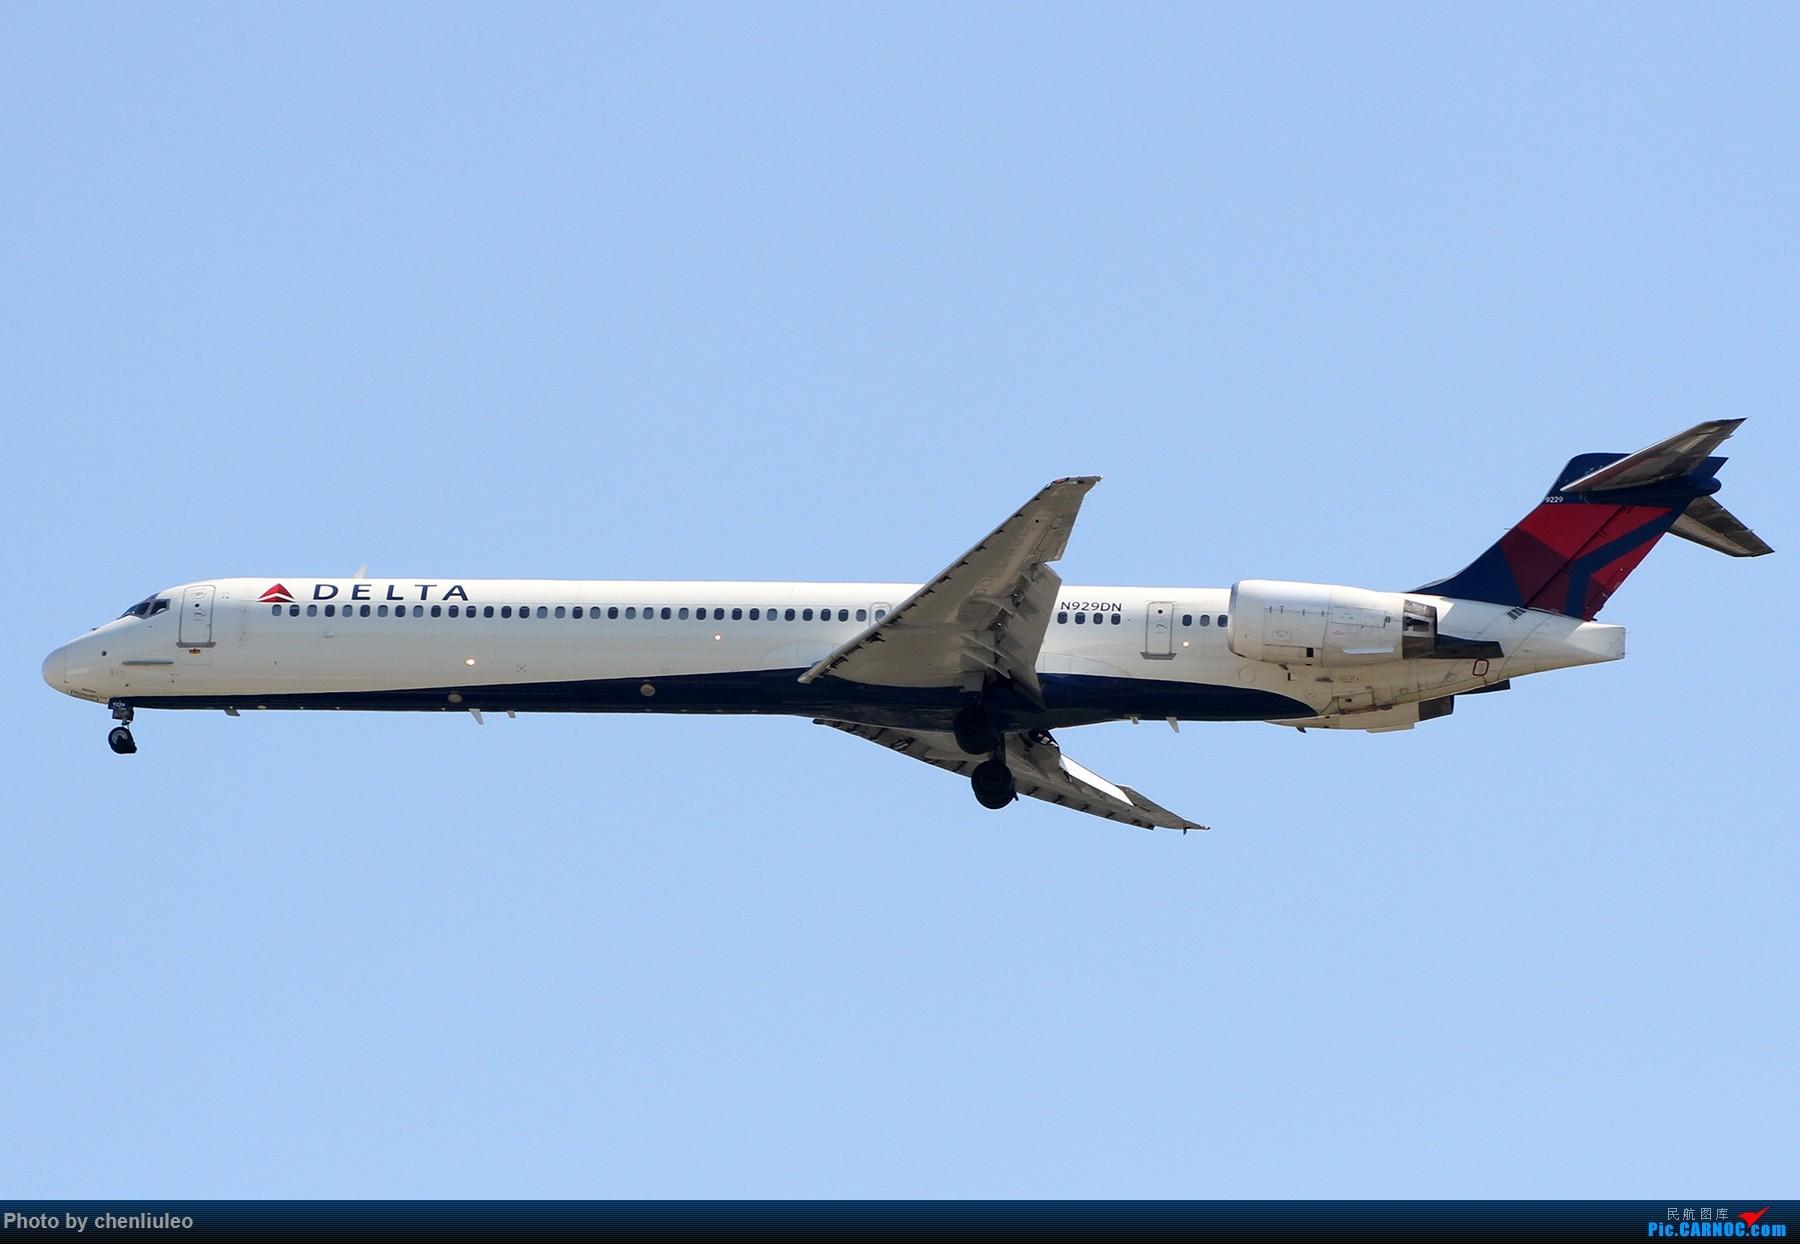 Re:【北美飞友会】本来是去等西南航空的新加州一号彩绘 结果有意外惊喜 美军C-40C MD MD-90-30 N929DN 美国圣路易斯机场